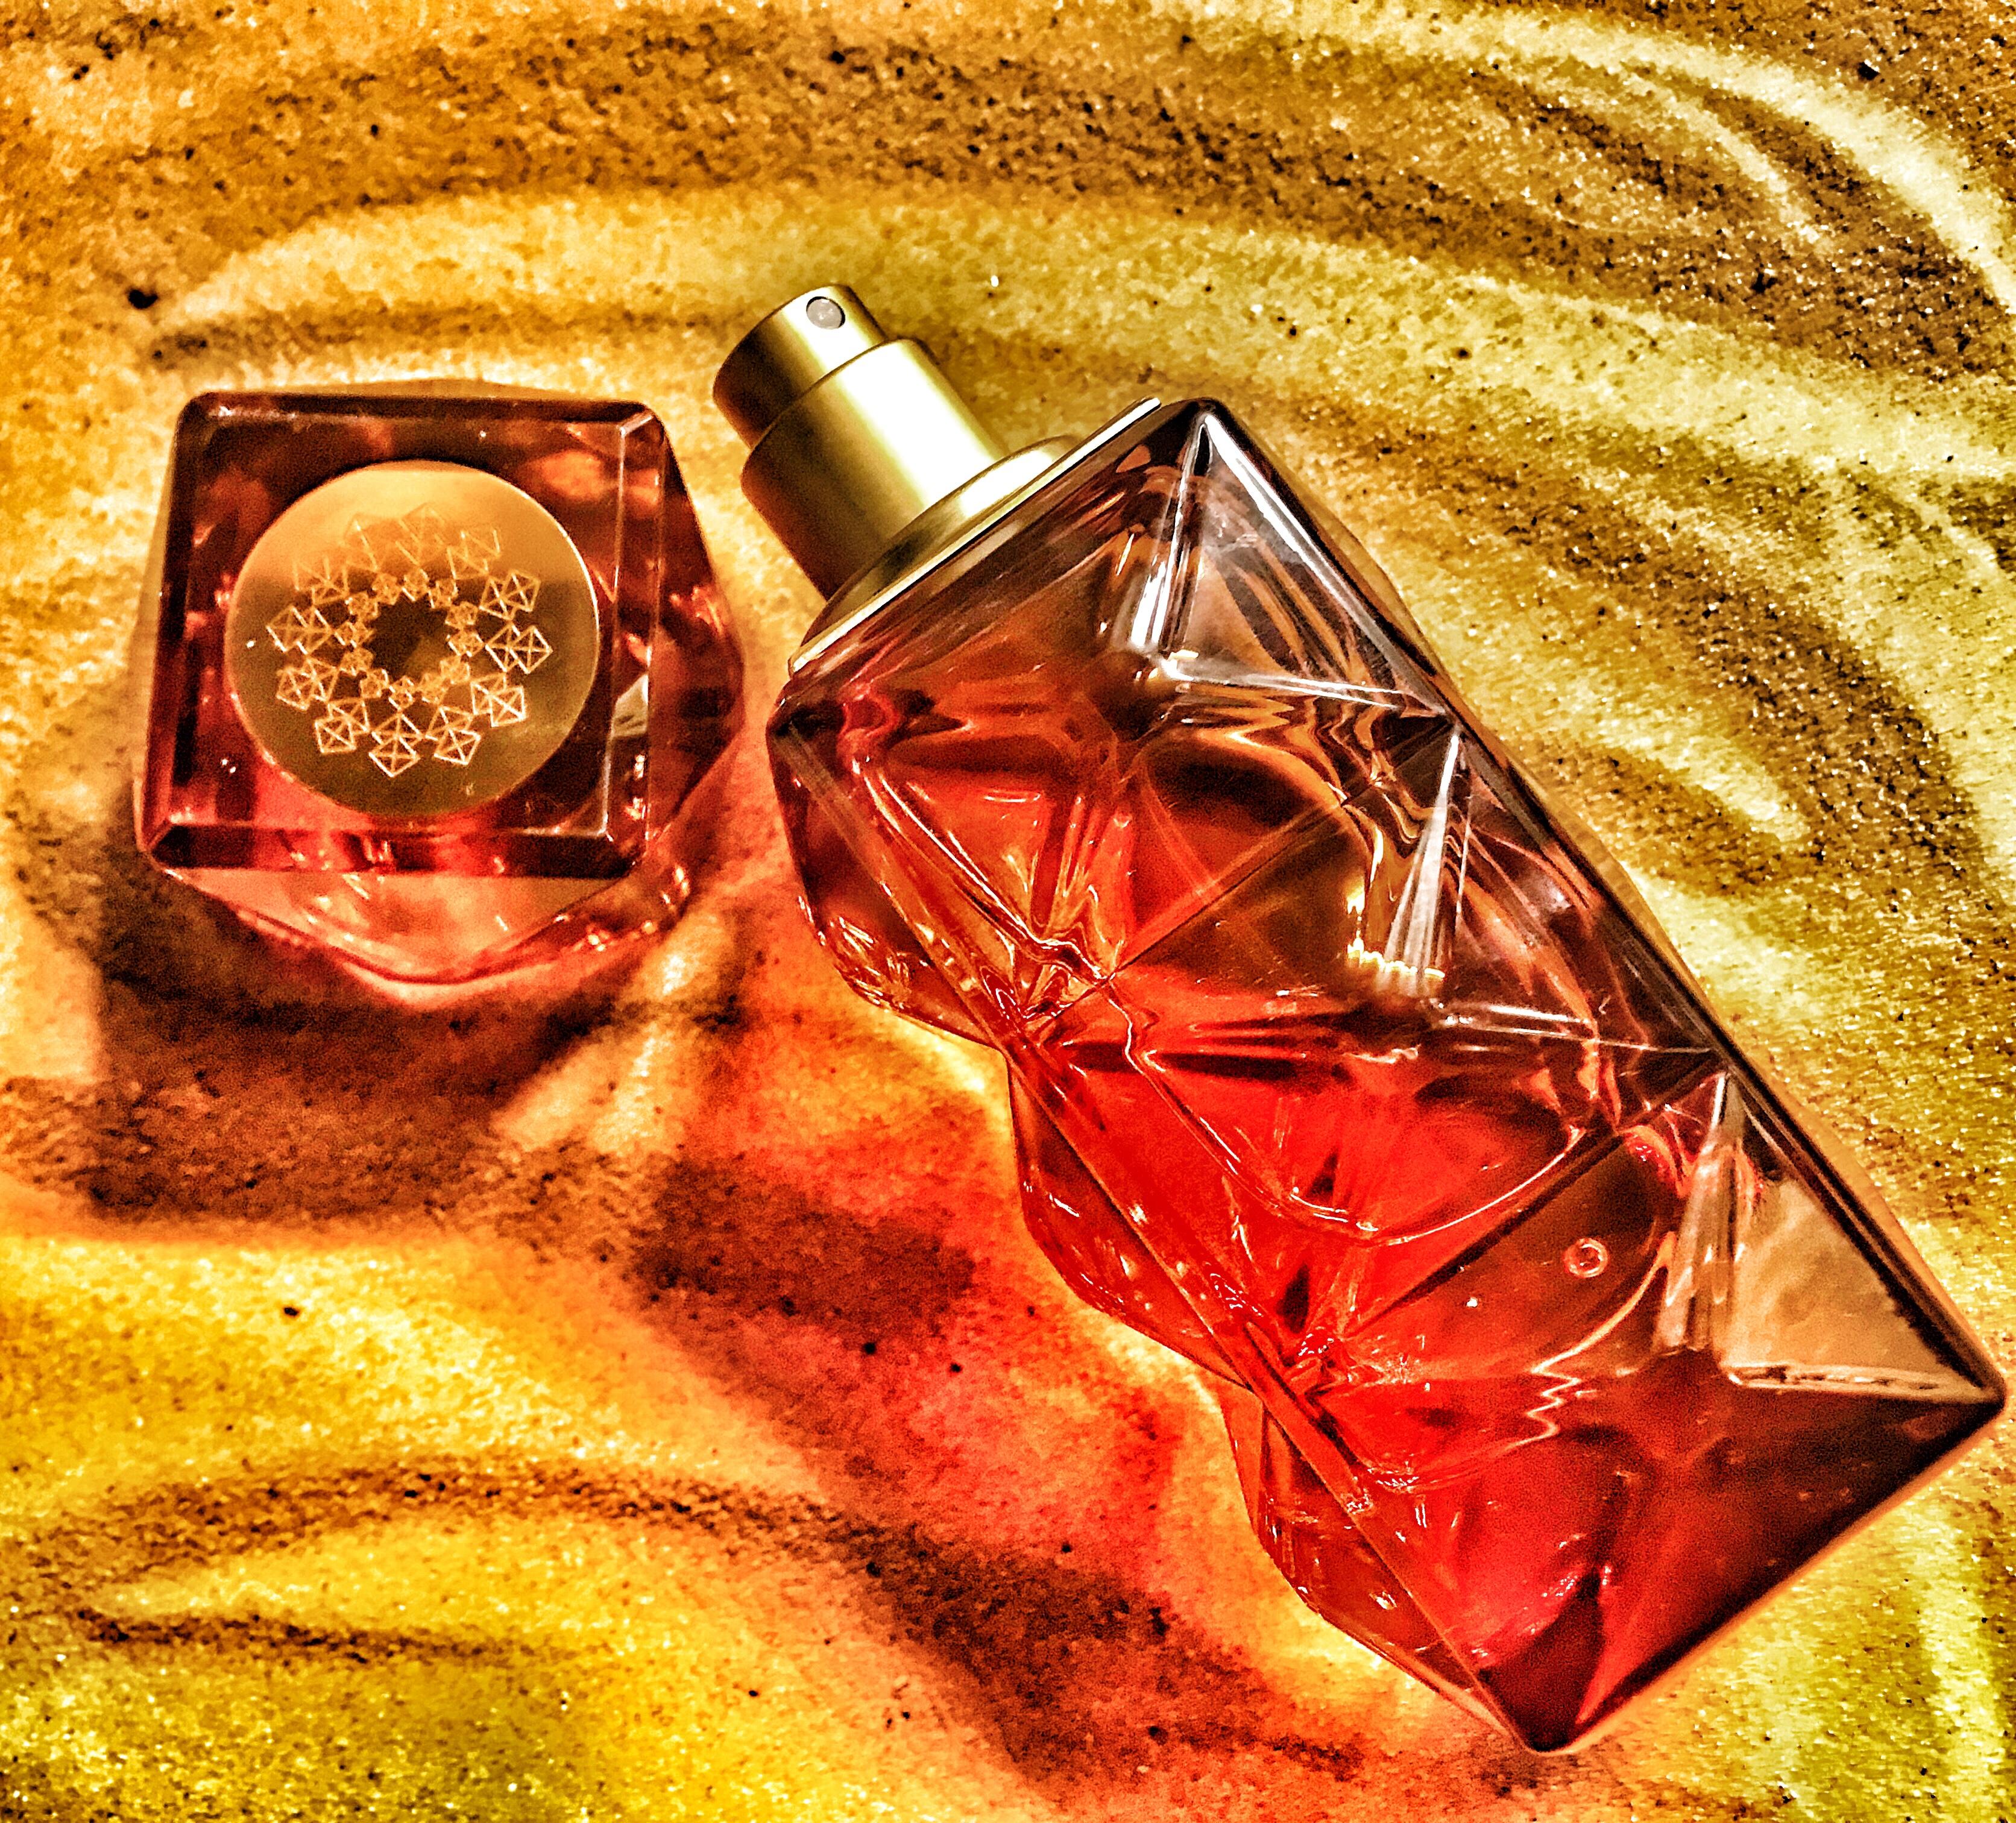 Fo'ah No14 Perfume